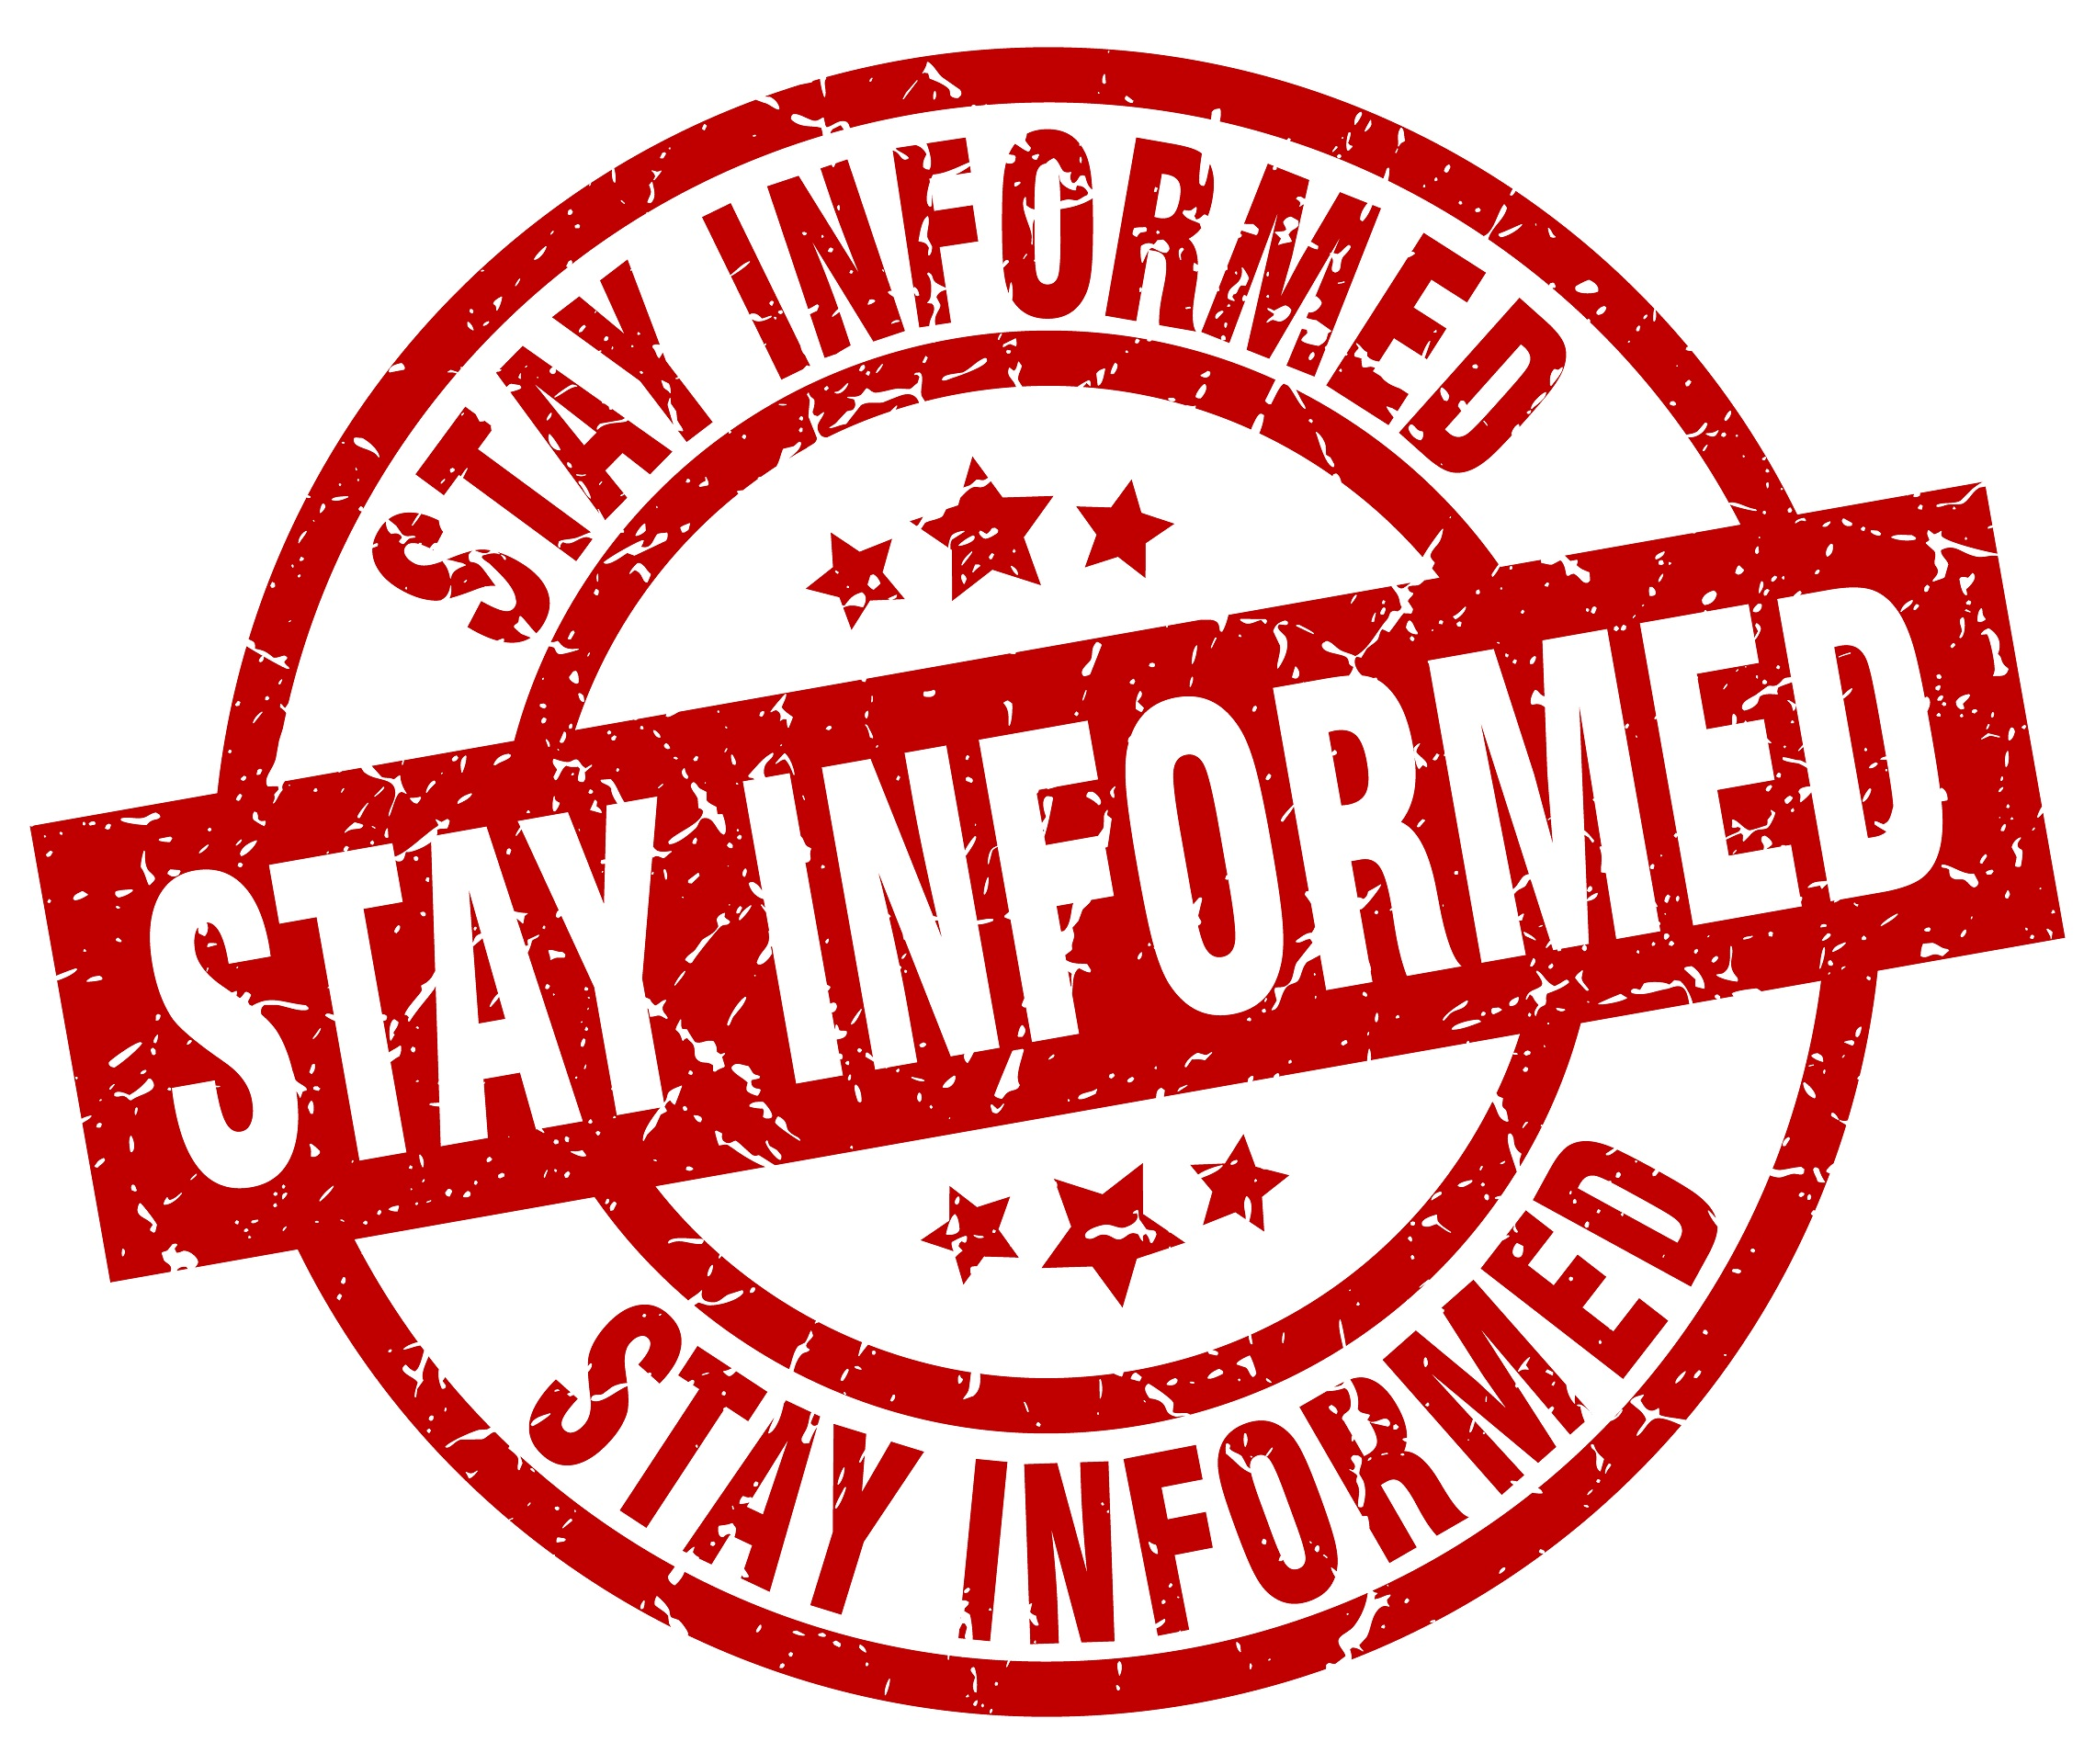 News : Public Encouraged to Stay Informed on Coronavirus